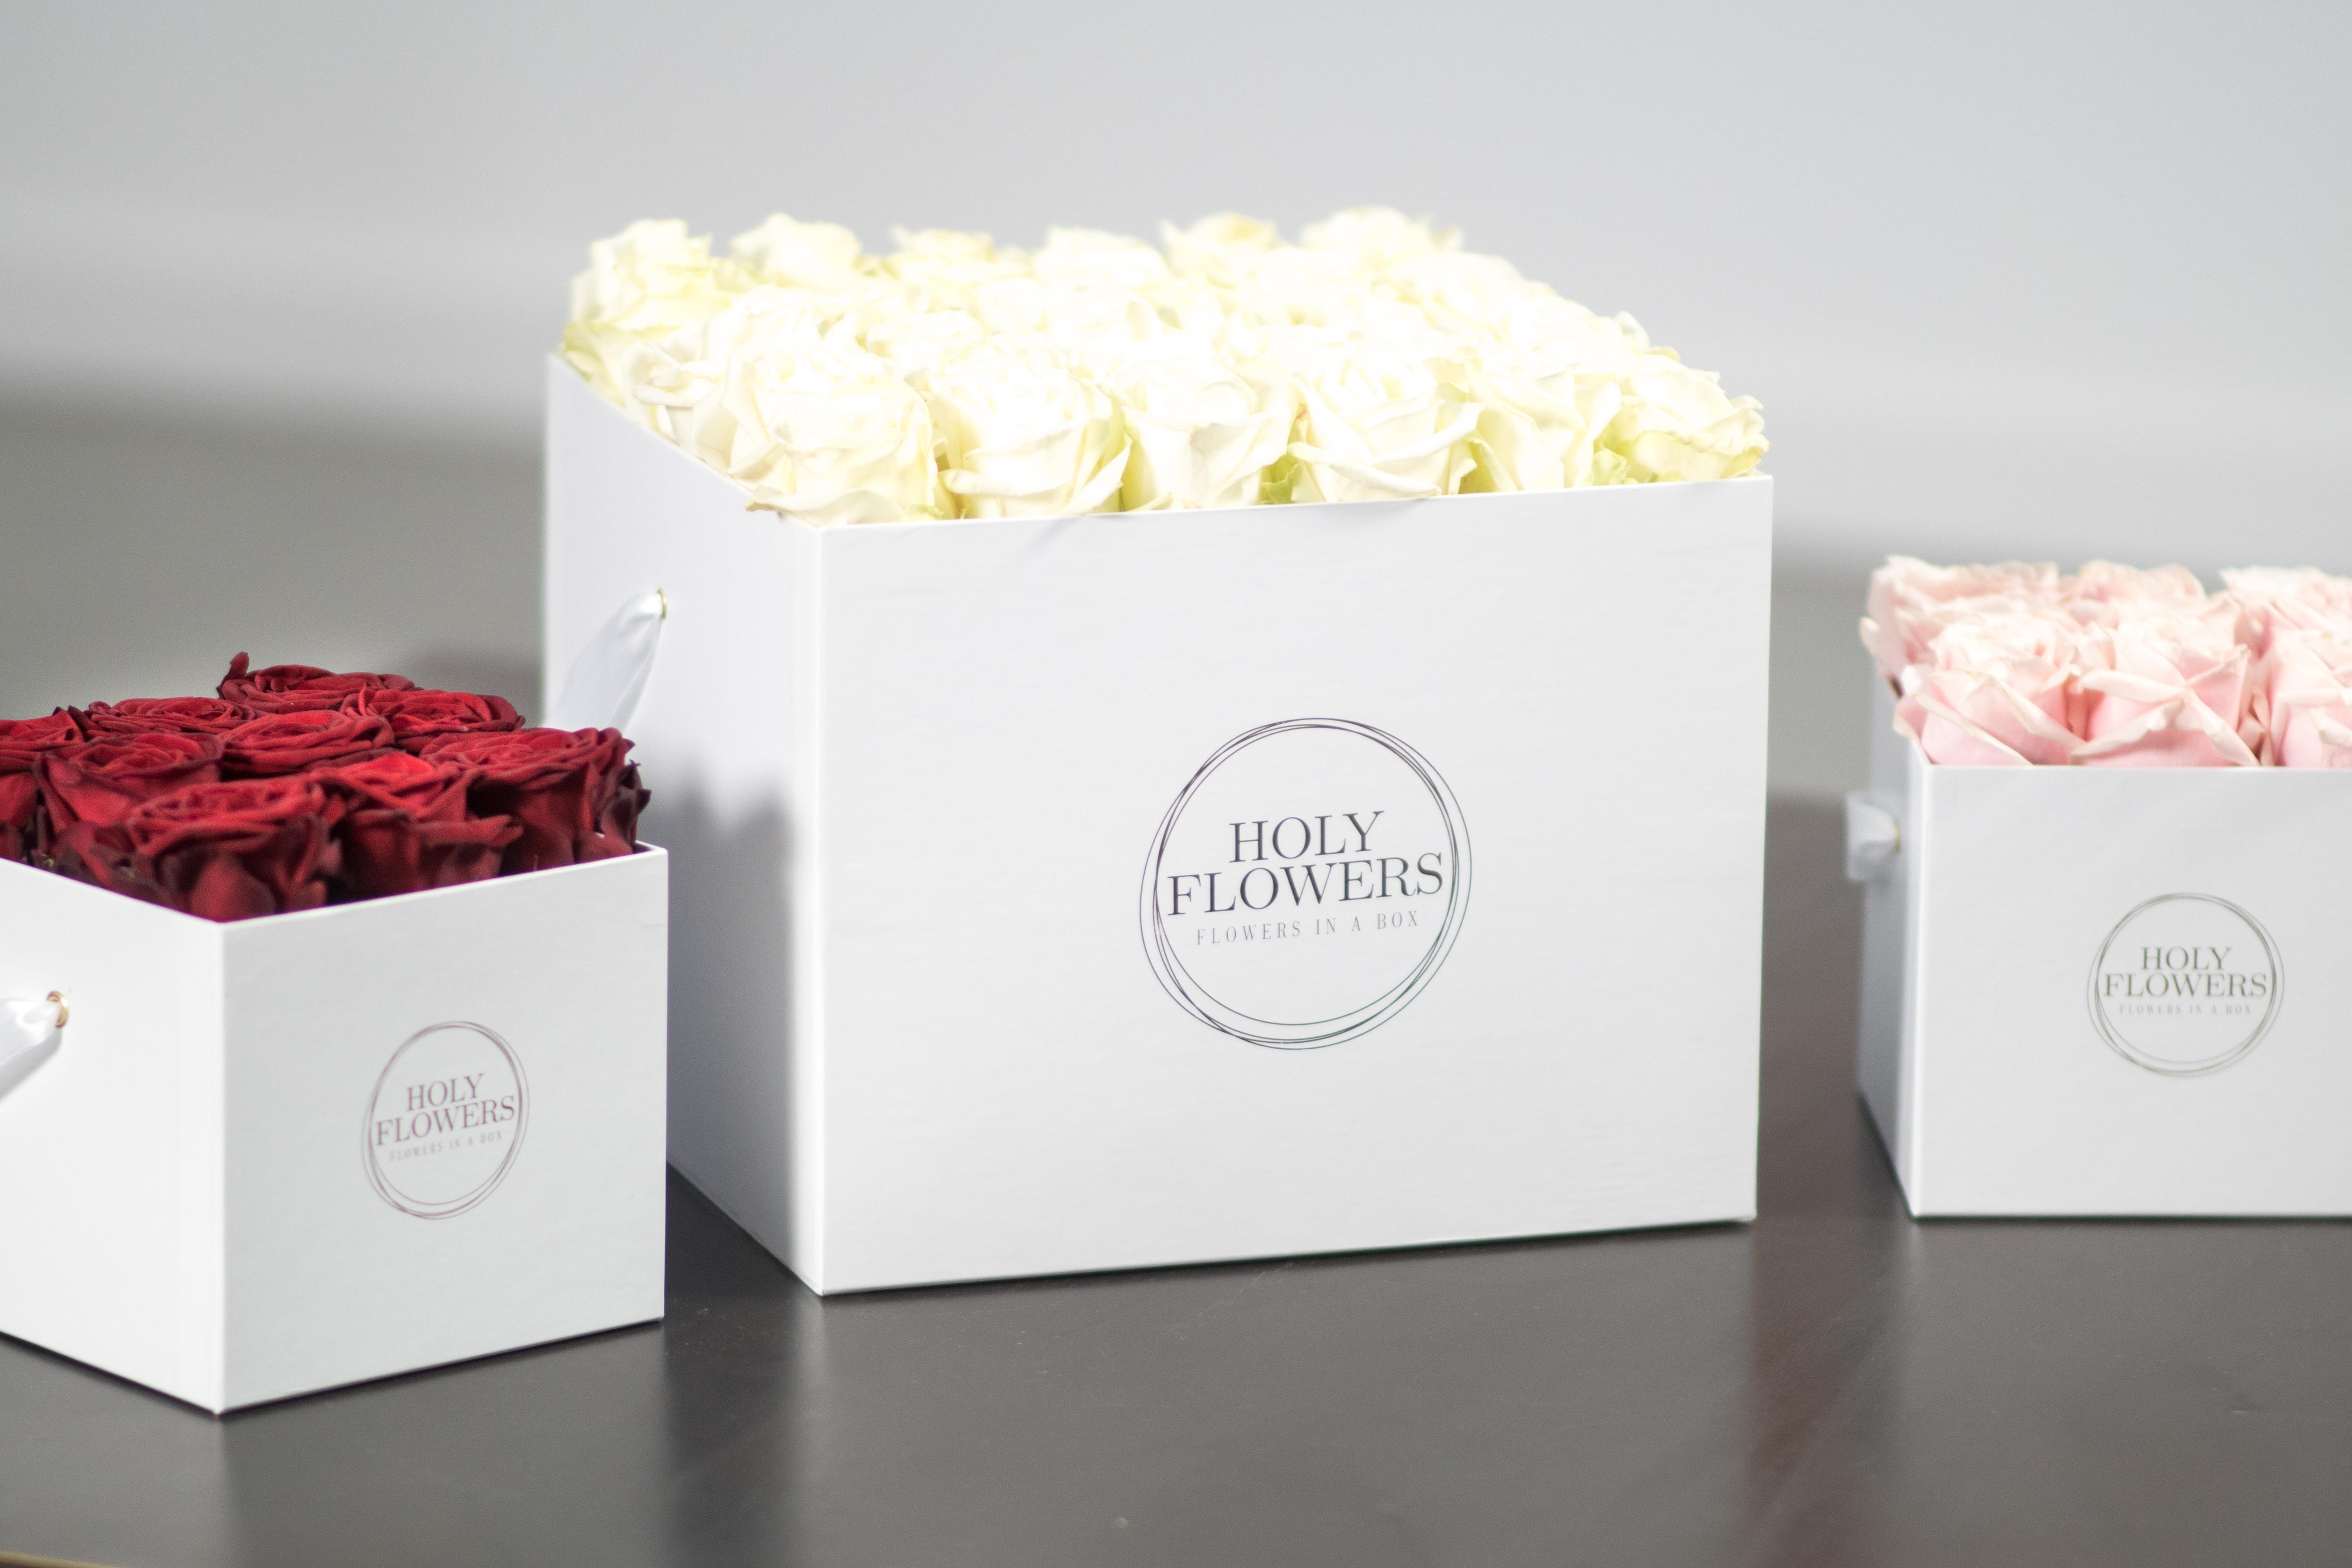 so funktionierts holy flowers rosen in der box exklusive rosenboxen. Black Bedroom Furniture Sets. Home Design Ideas